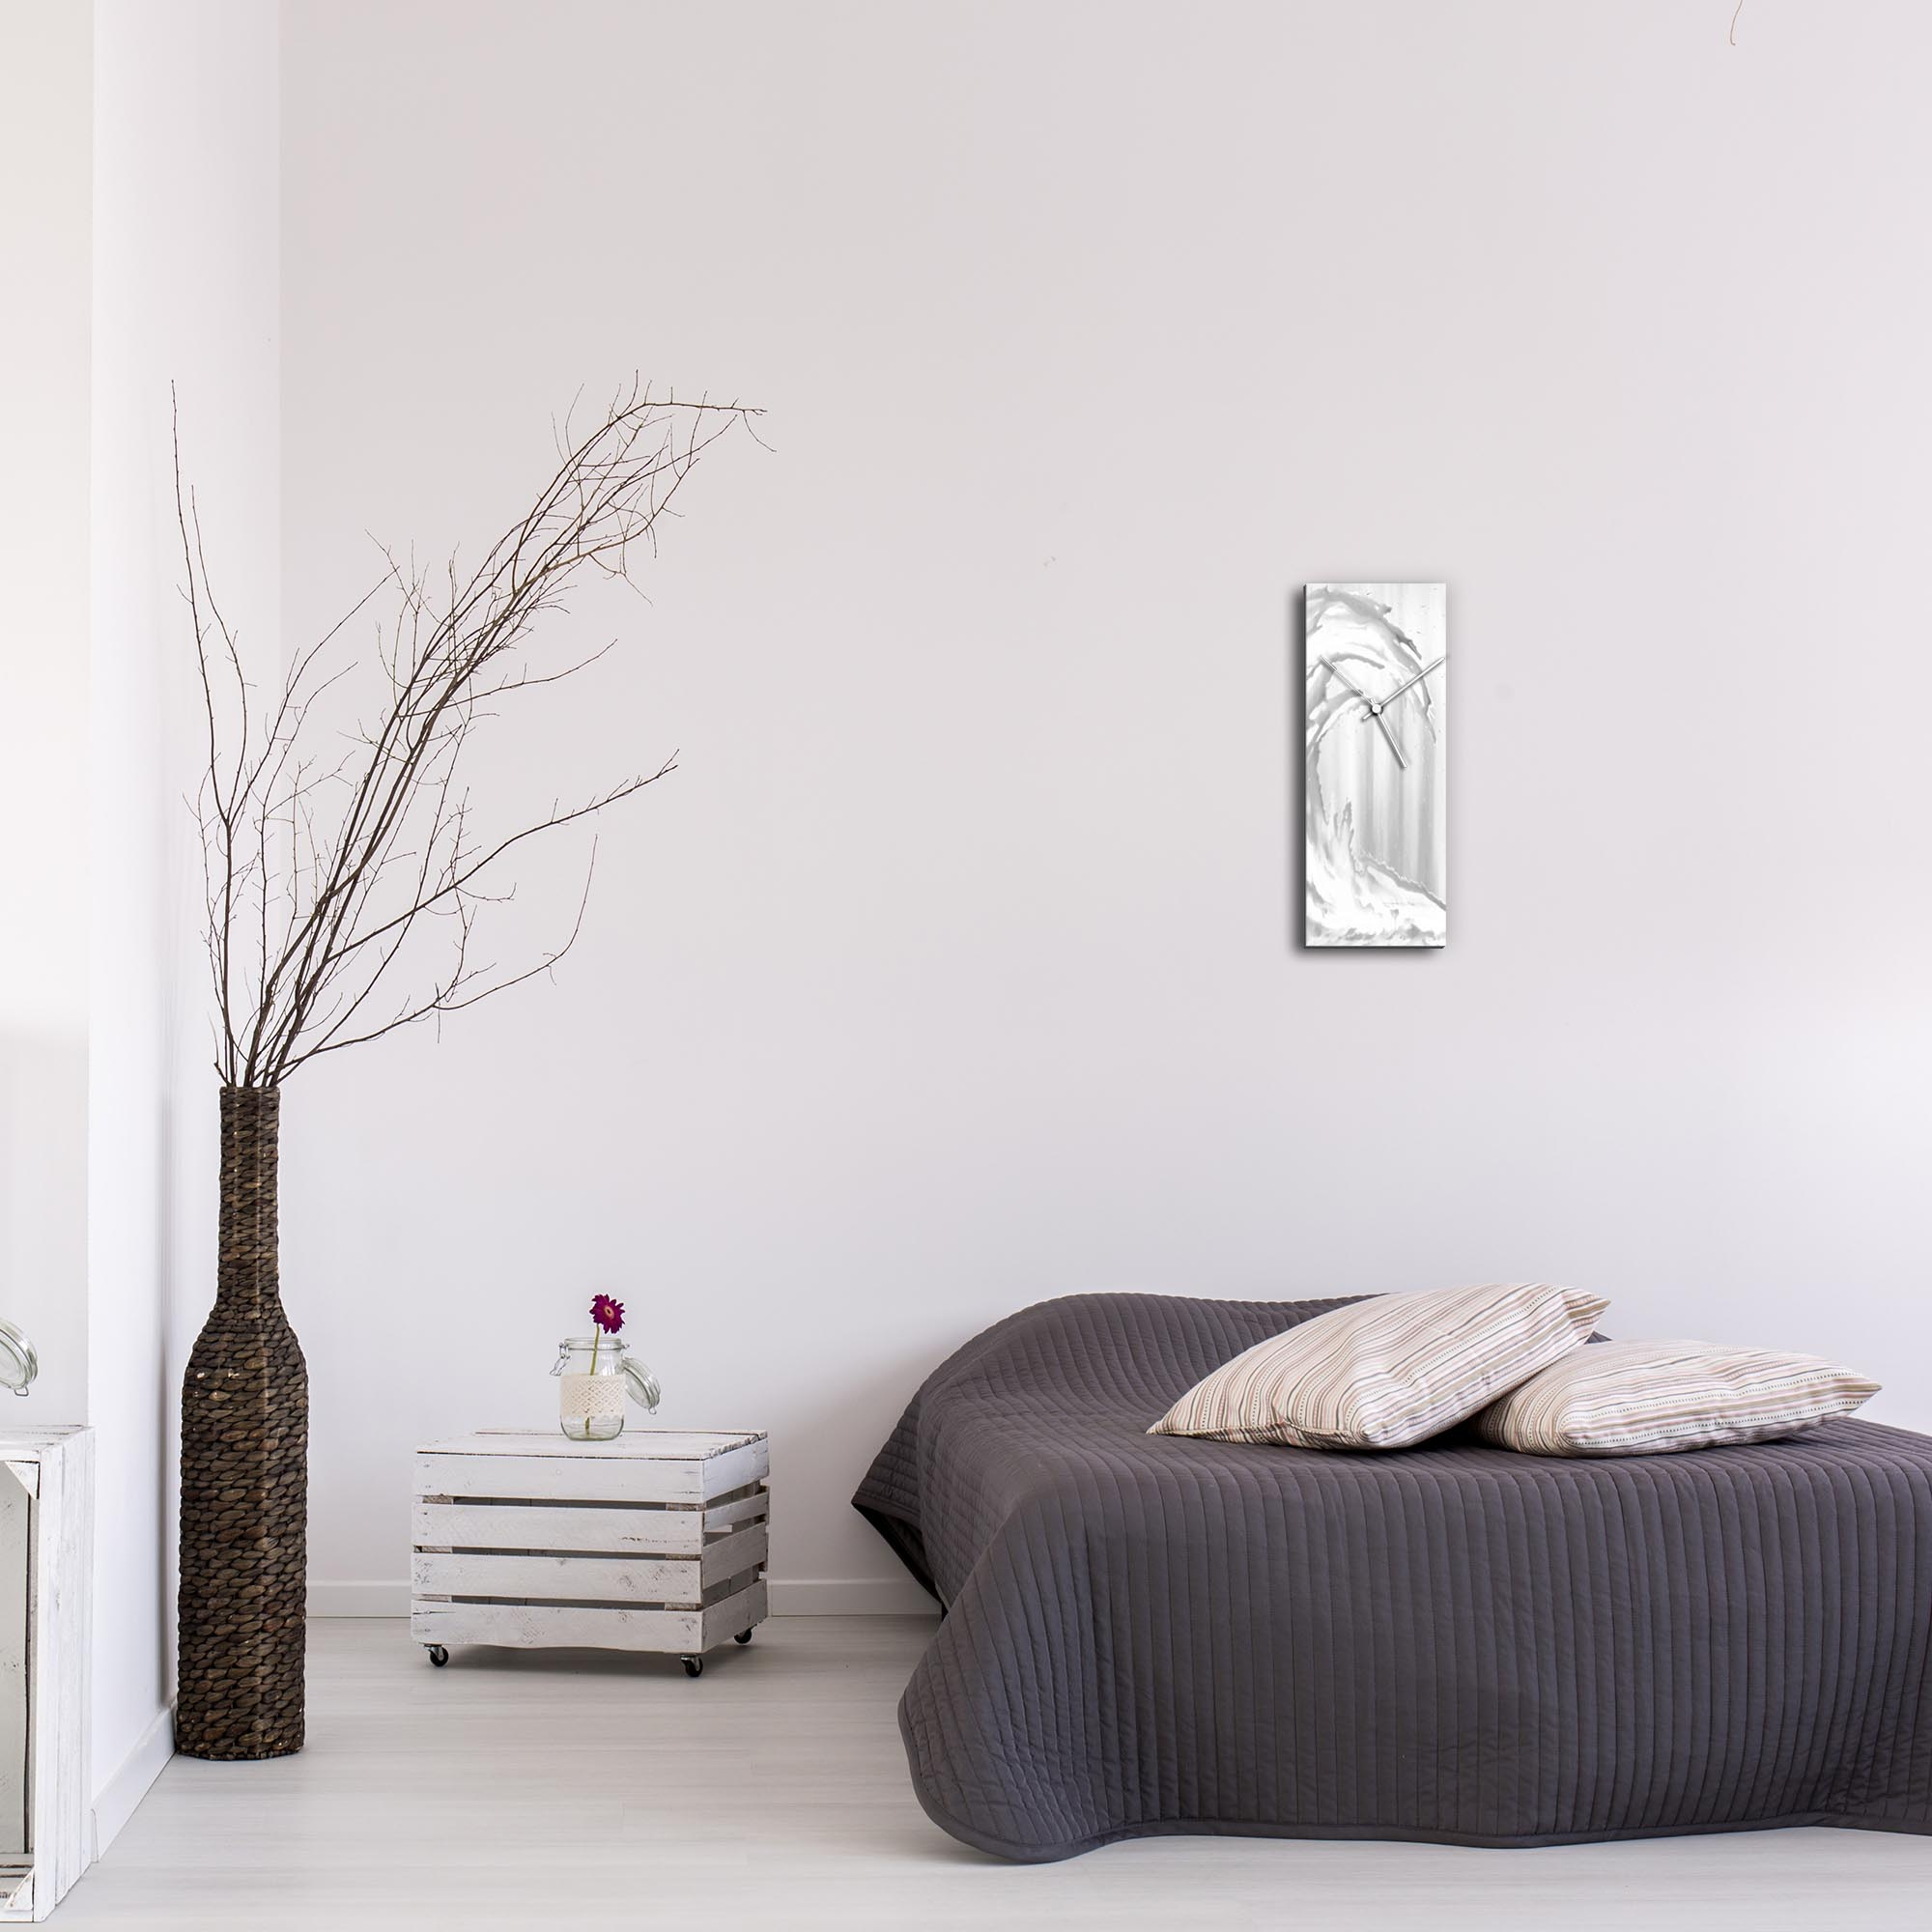 White Wave v1 Clock by Mendo Vasilevski - Urban Abstract Home Decor - Lifestyle View